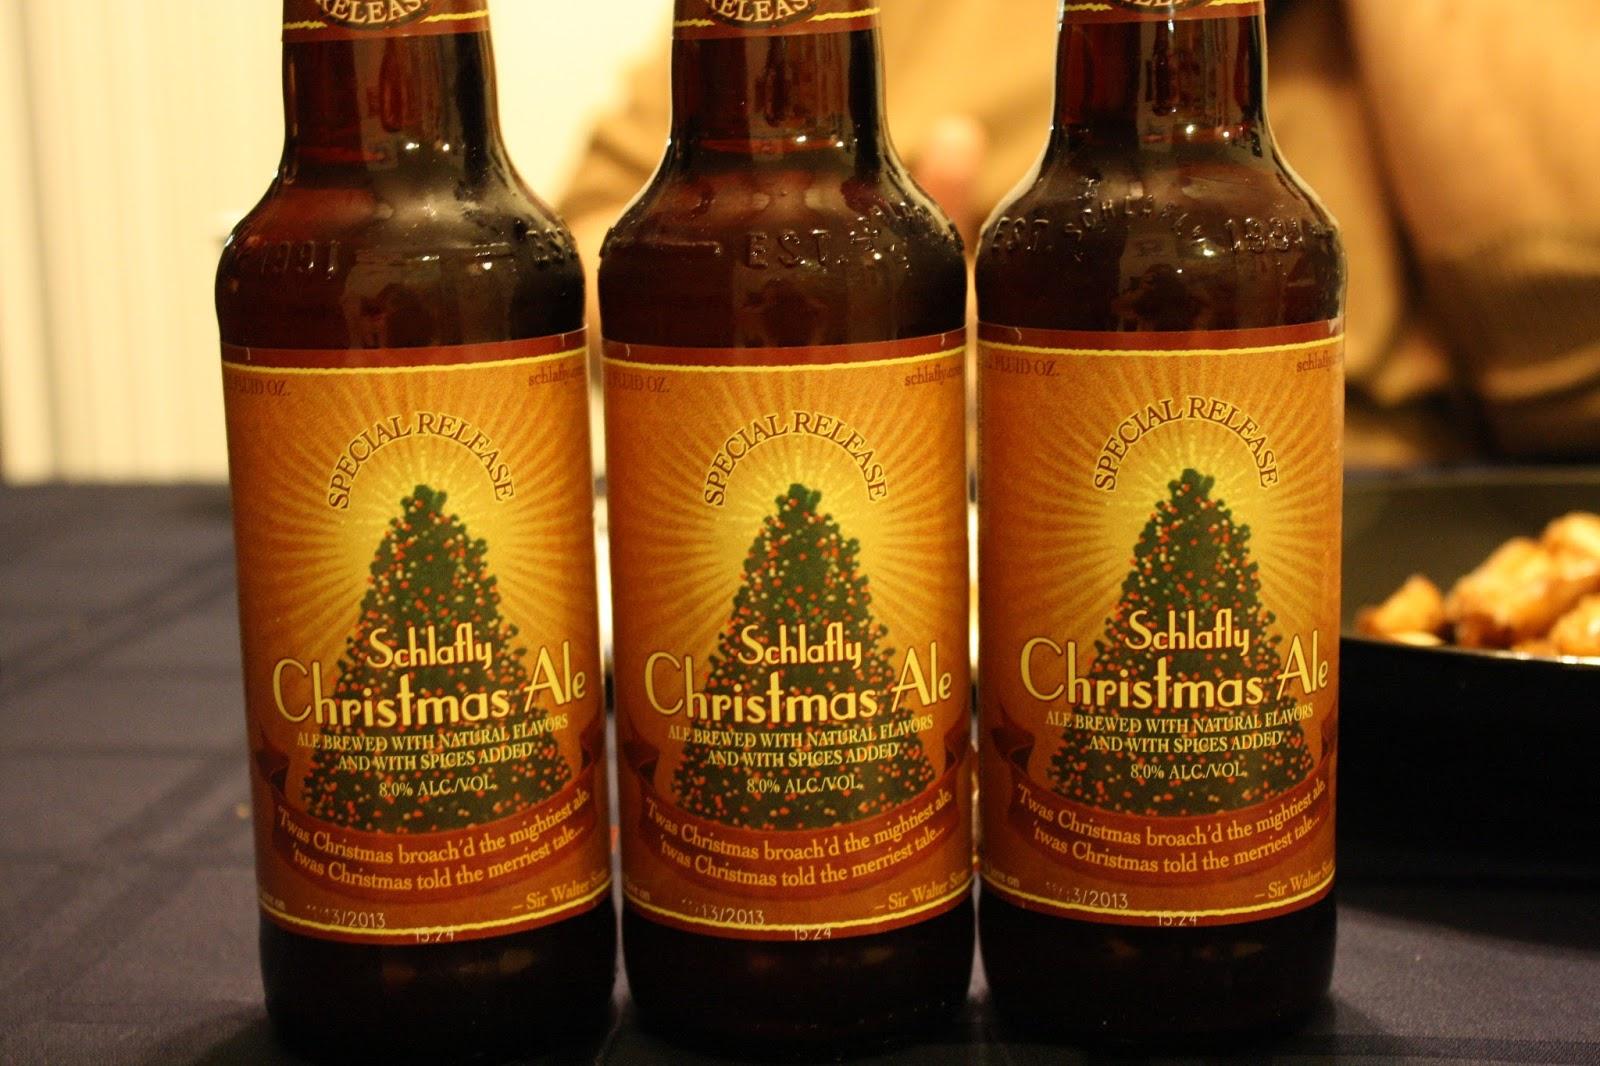 IndianaBeer: 12 Beers of Christmas